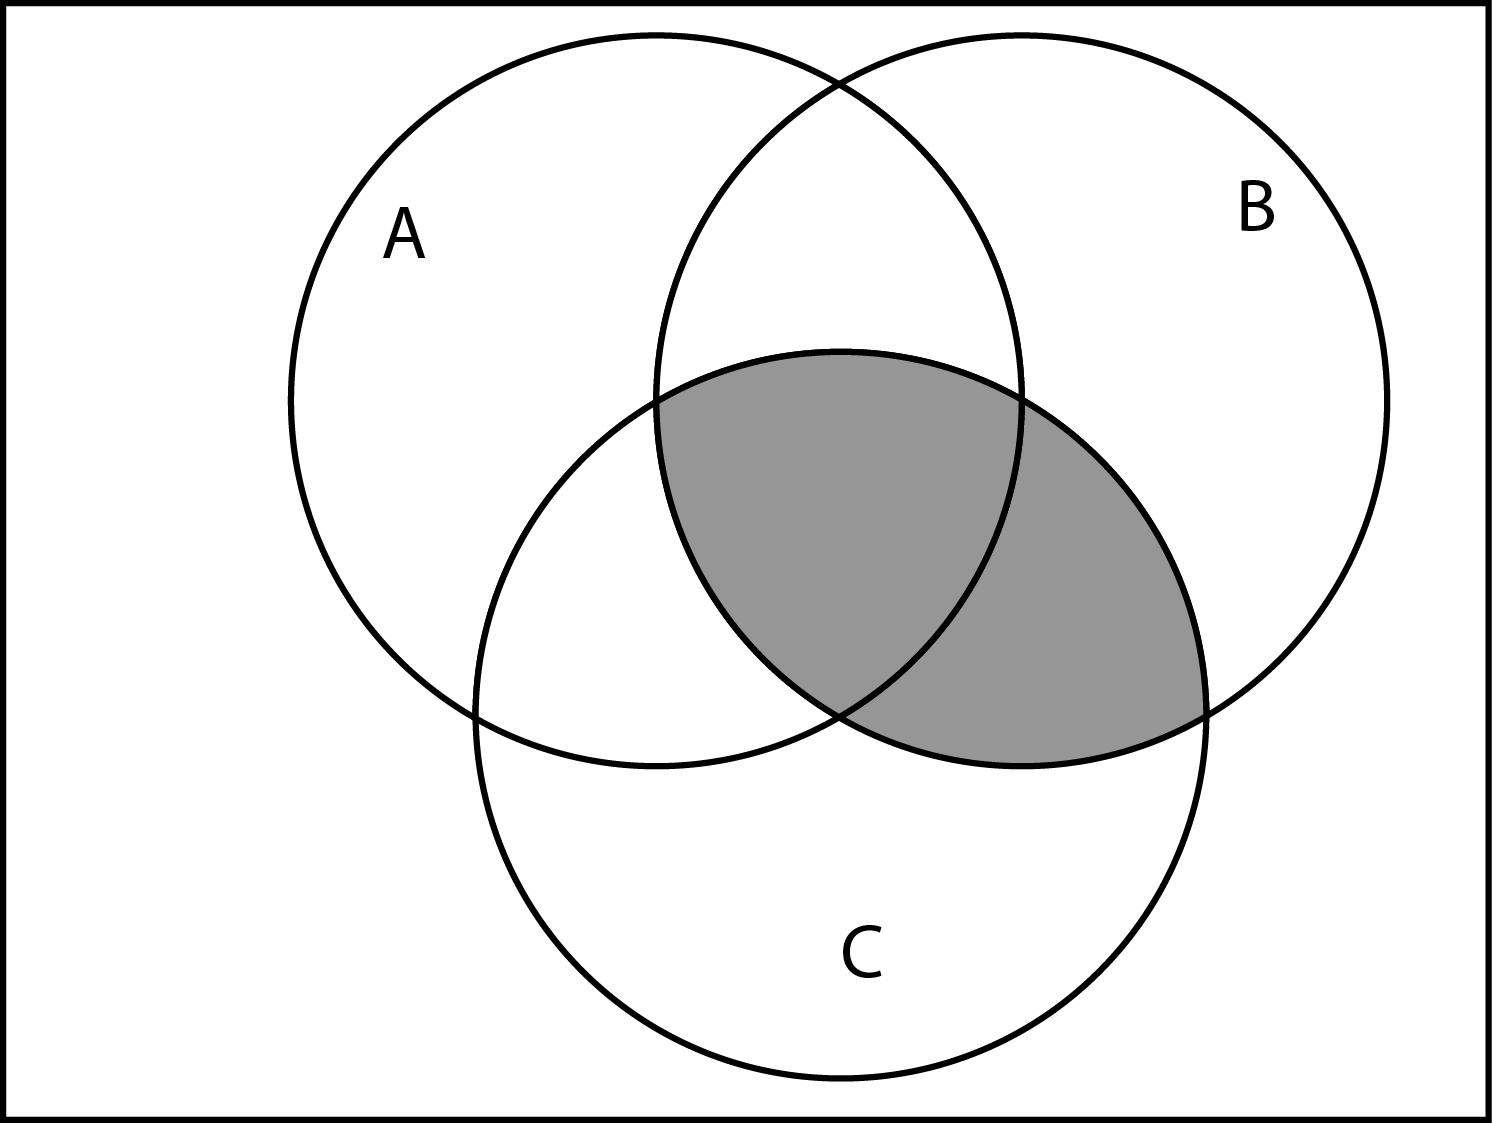 Generous 3 venn diagram template pictures inspiration wordpress index of johwd63181mat142venn diagram templates pooptronica Images